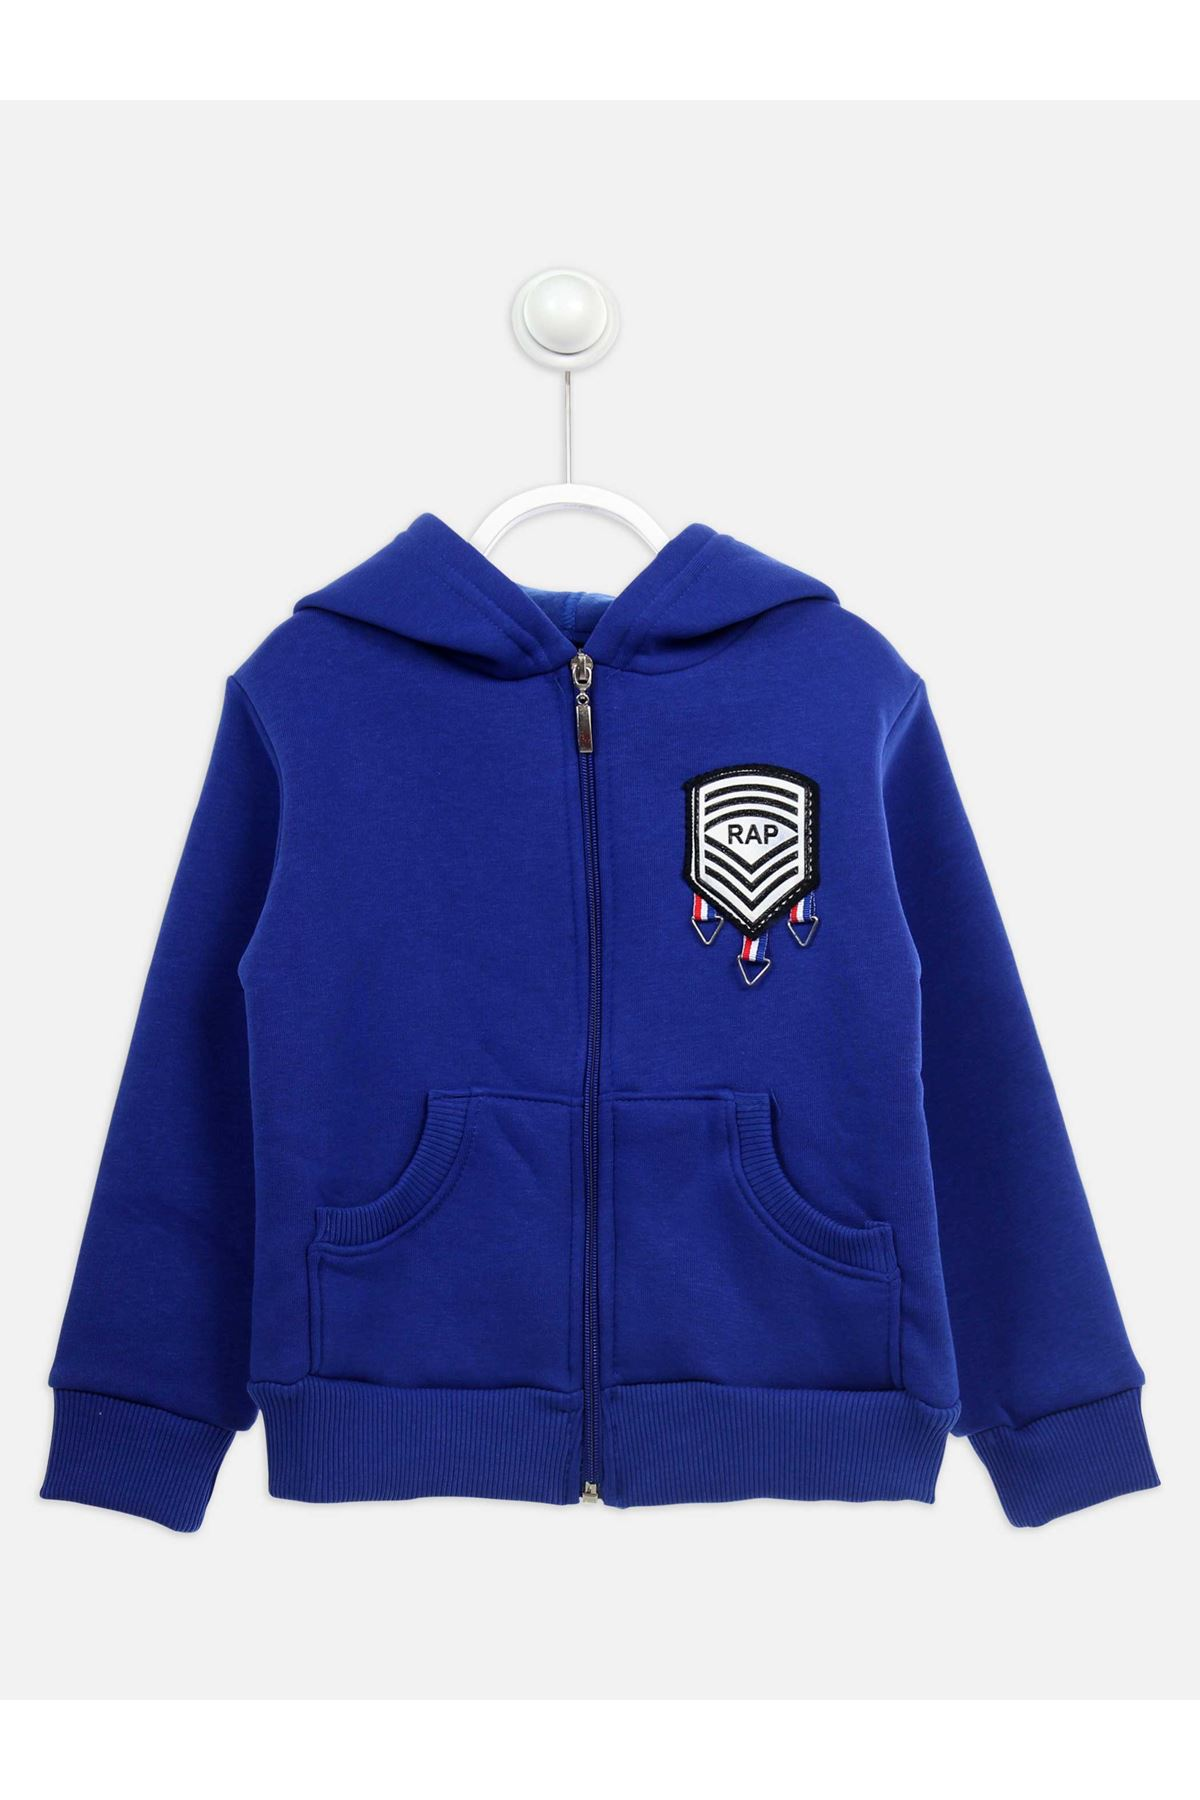 Sax Winterisation Male Child Jacket